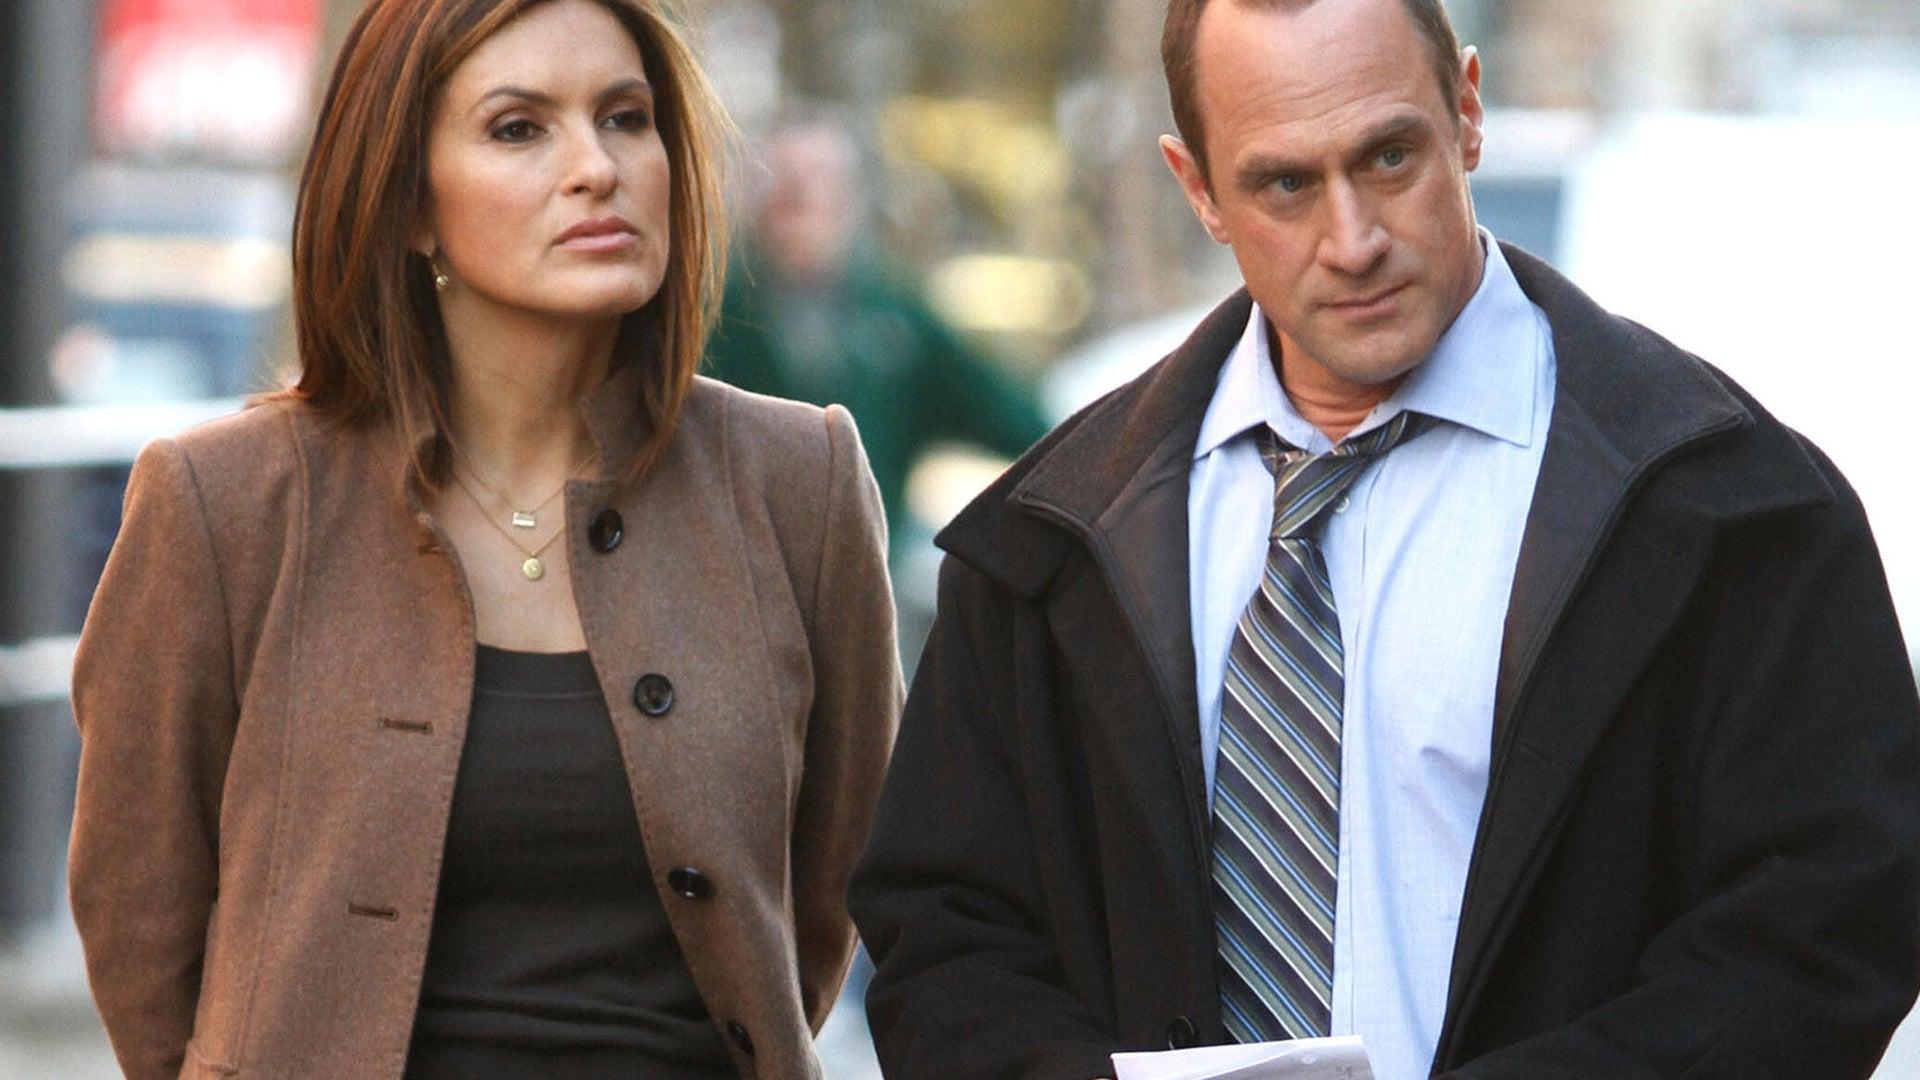 Mariska Hargitay and Chris Meloni, Law and Order: SVU